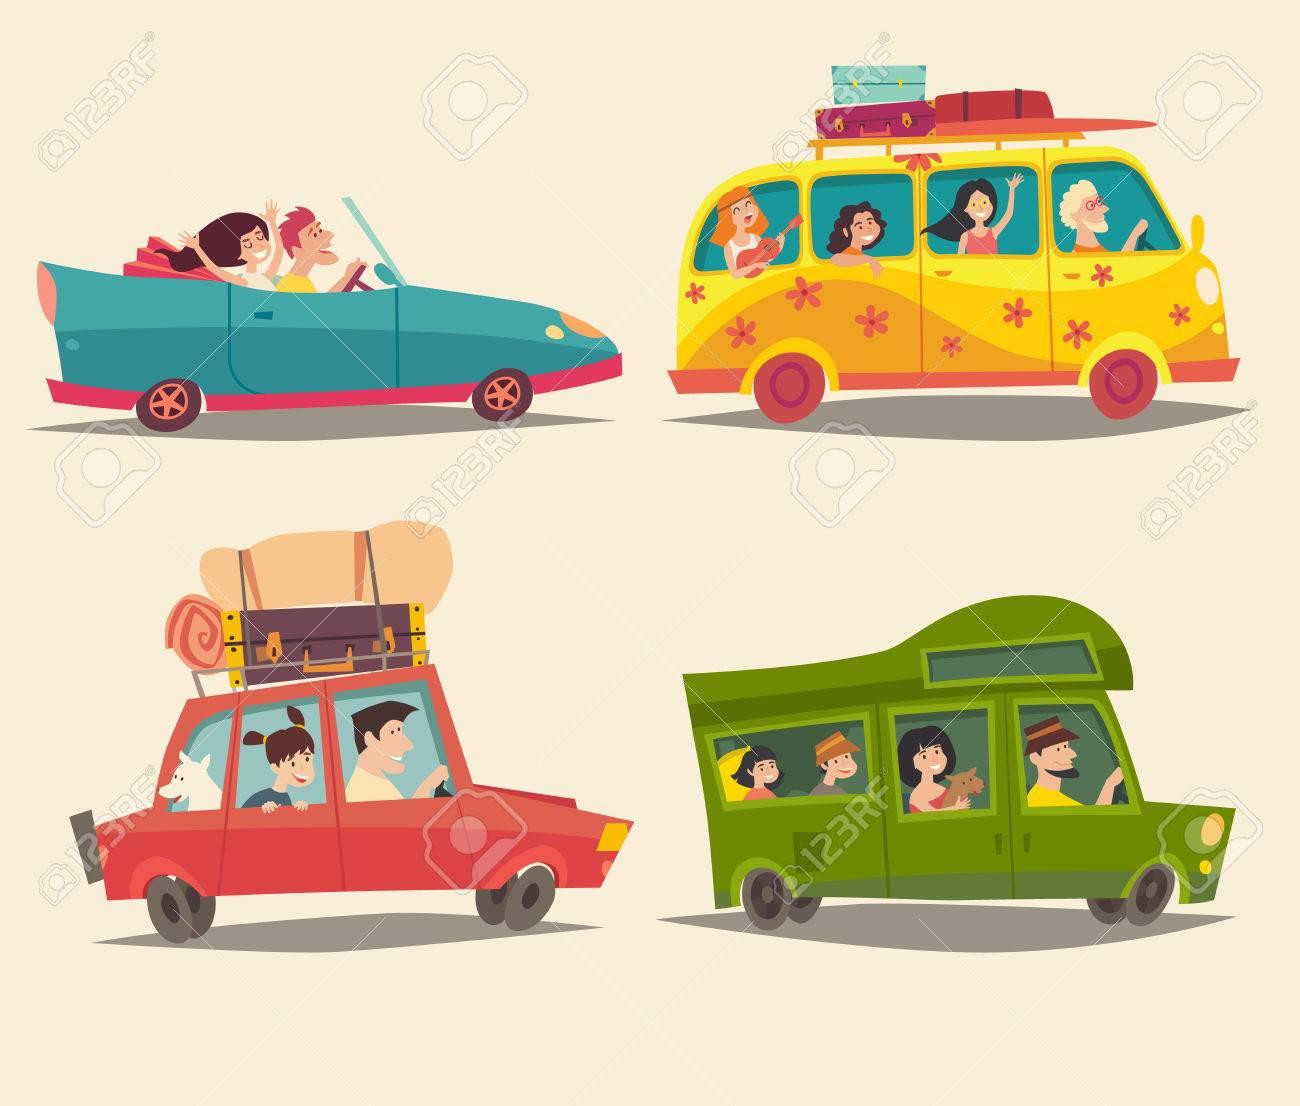 Voyager En Voiture Cabriolet Van Et Trailer Avec Des Gens Heureux